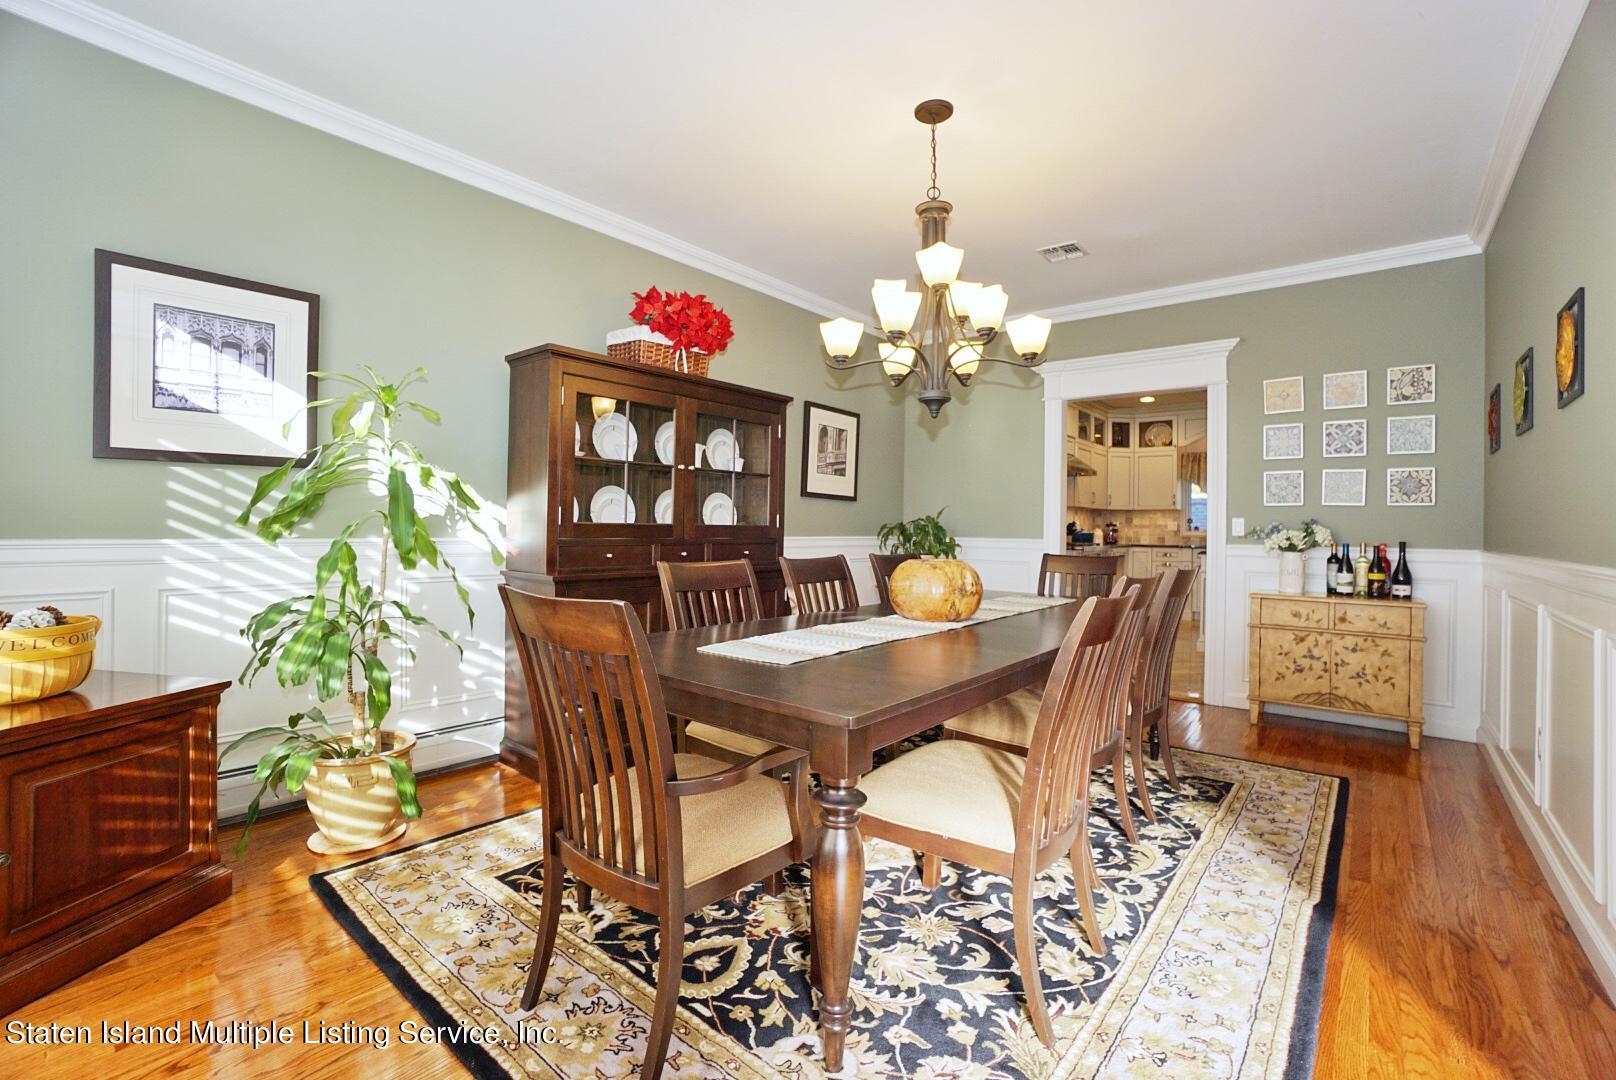 Single Family - Detached 31 Belwood Loop  Staten Island, NY 10307, MLS-1143133-10